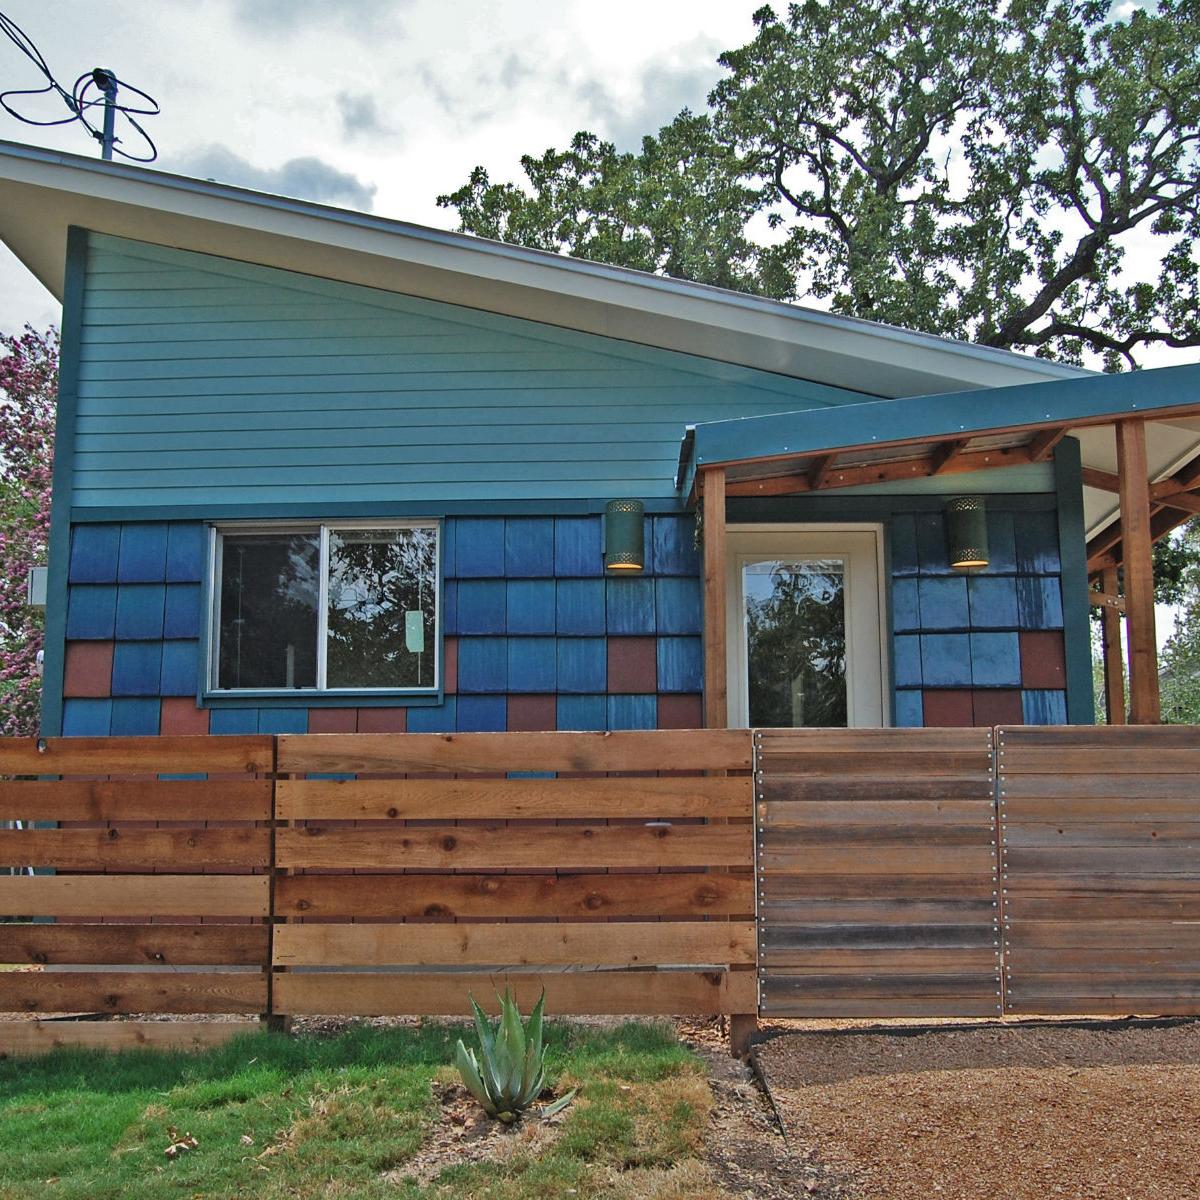 Austin Community Design & Development Center presents Alley Flat Homes Tour & Fundraiser